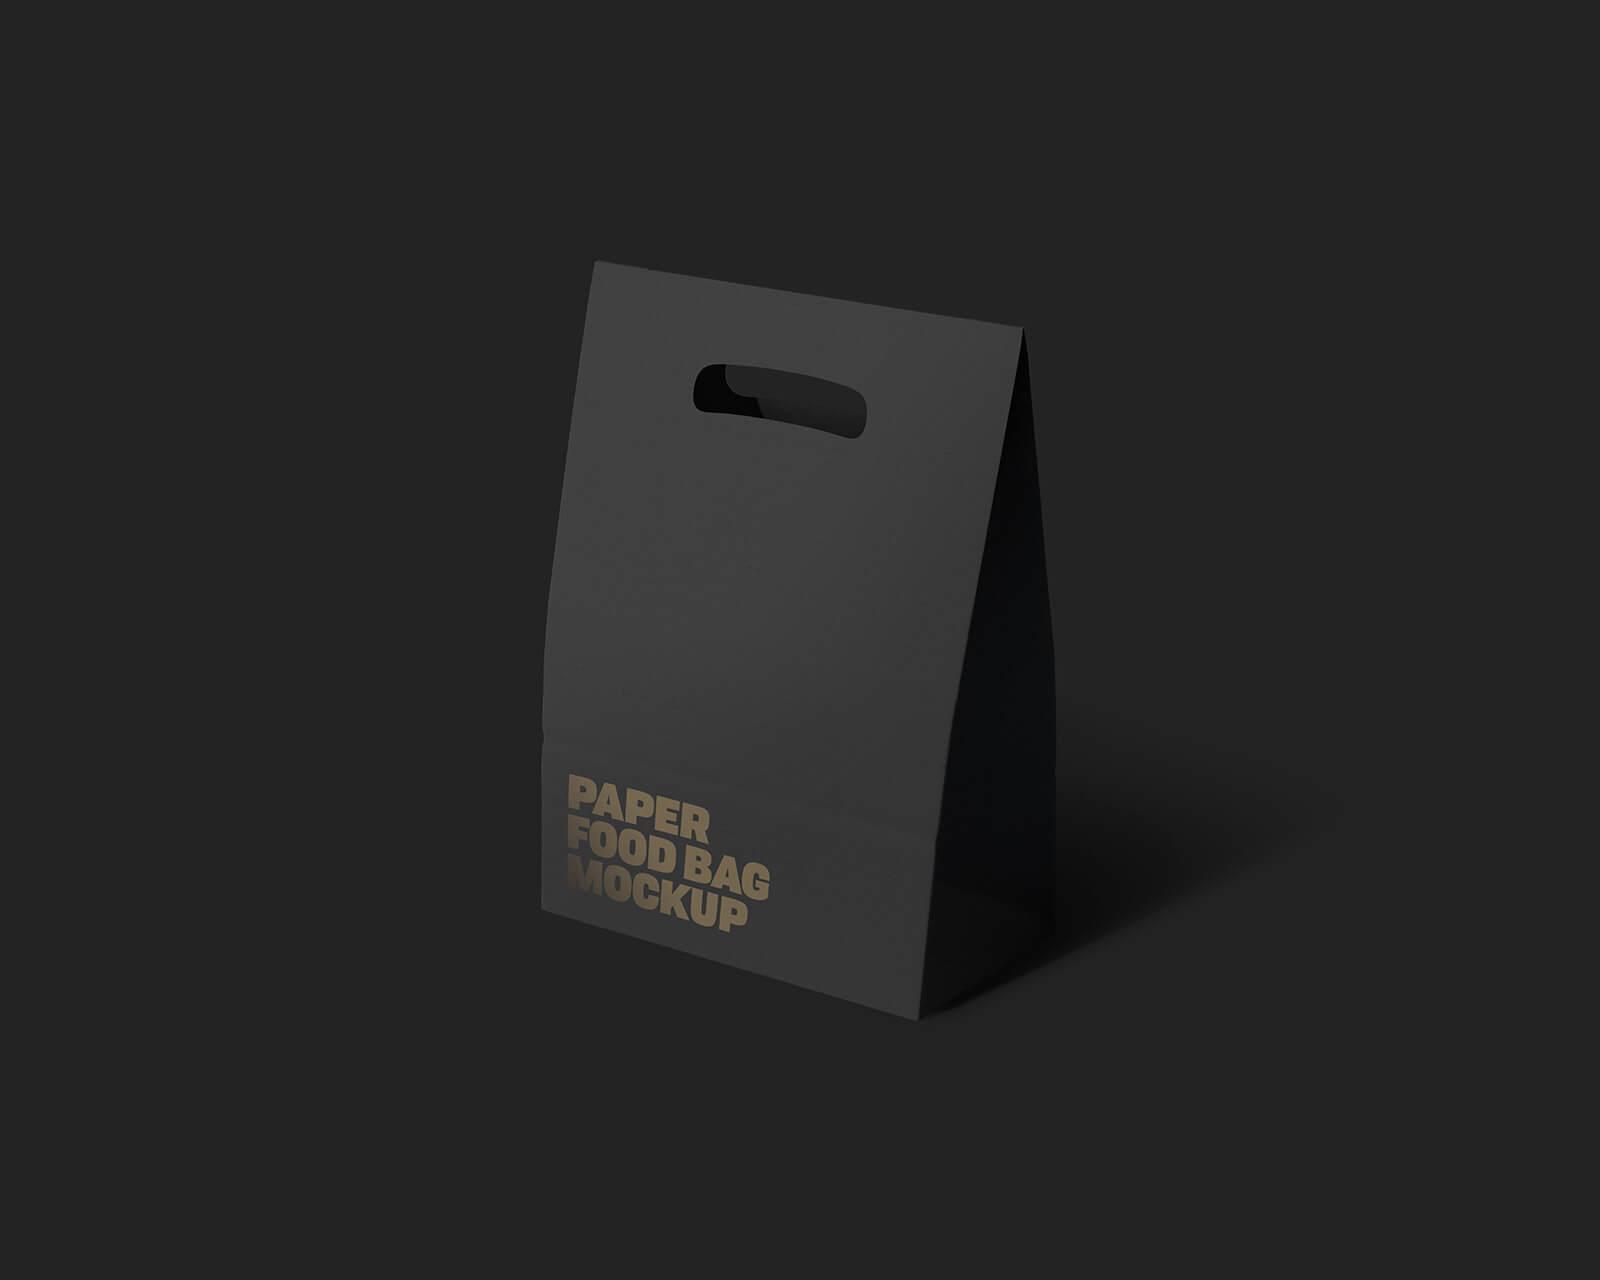 Free-Disposable-Kraft-Paper-Carry-Bag-Mockup-PSD-2